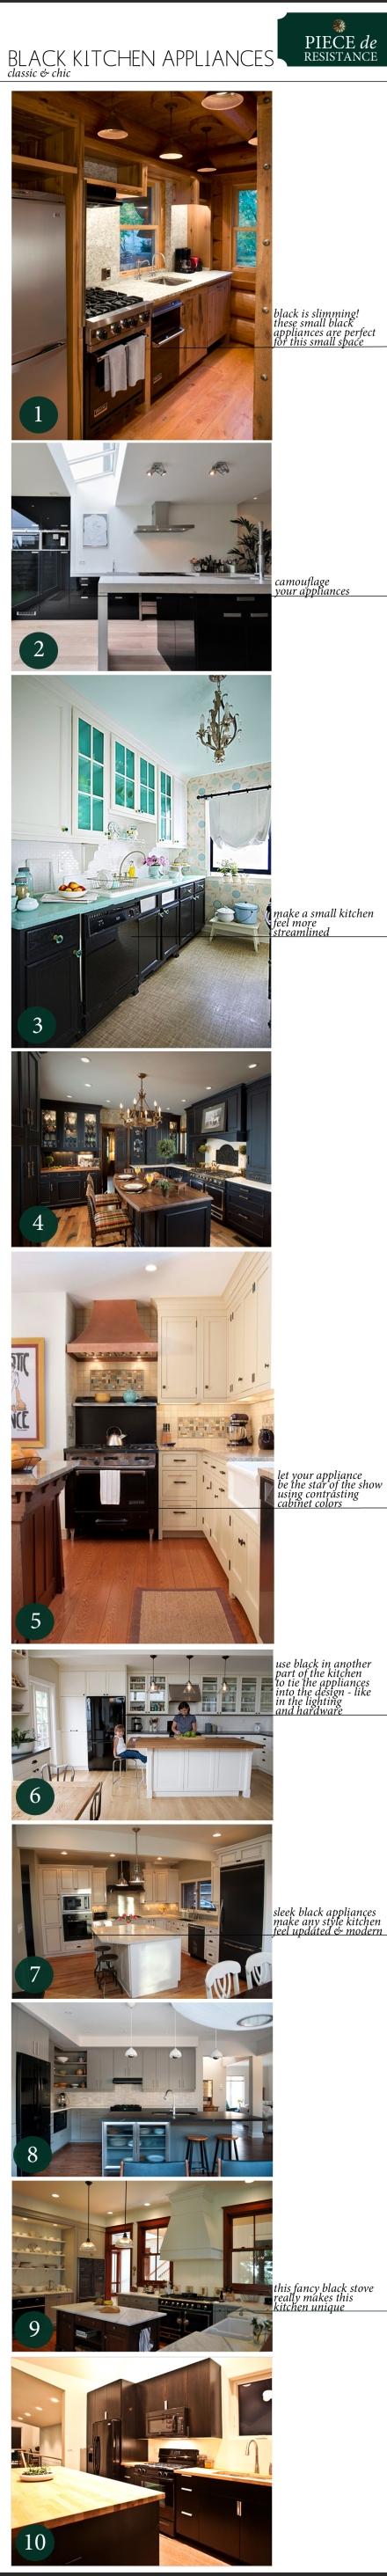 black-kitchen-appliances copy